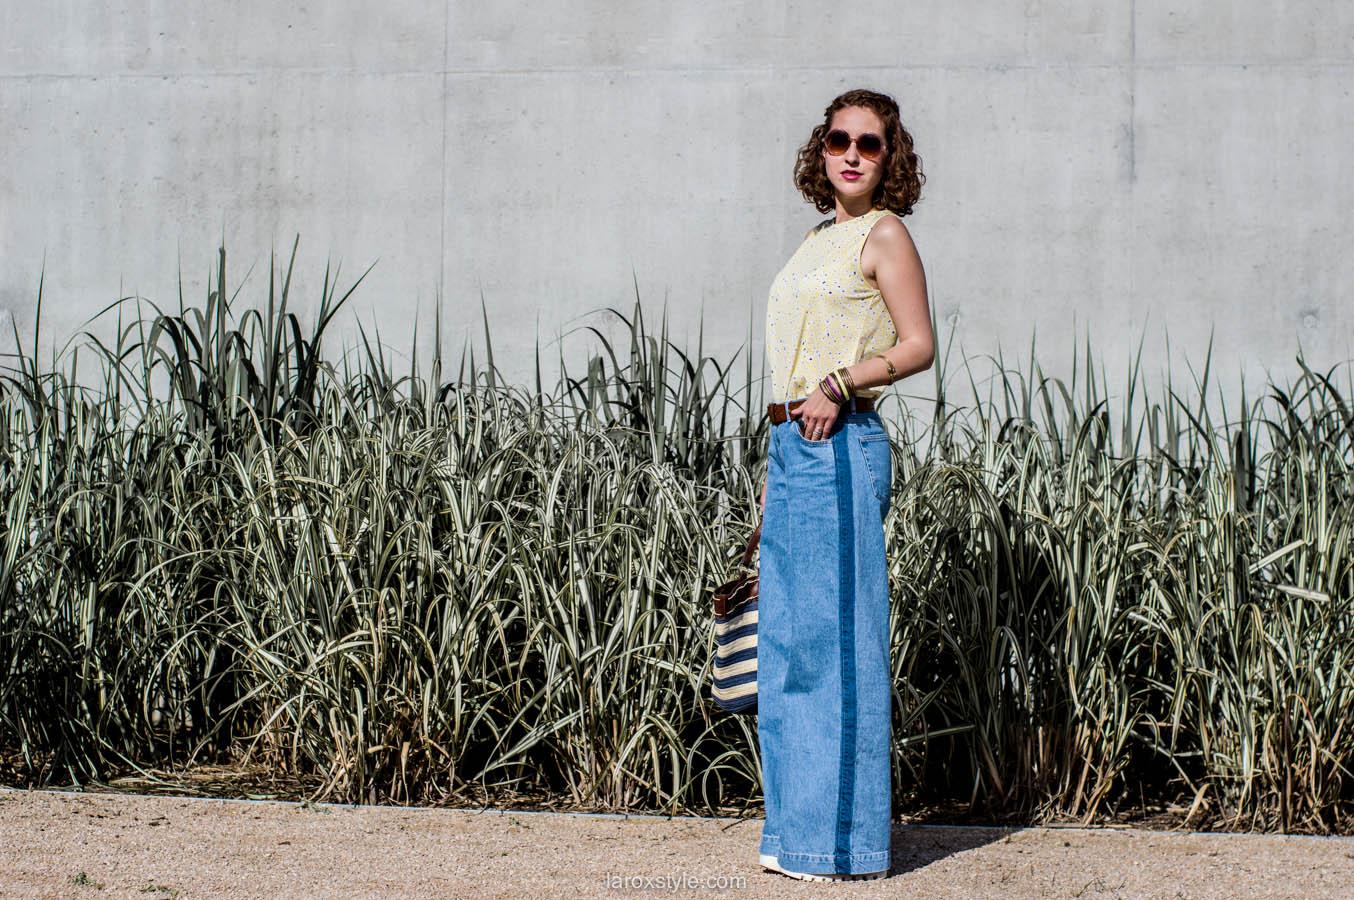 laroxstyle - blog mode lyon - look 70s - pantalon patte d elephant (14 sur 44)